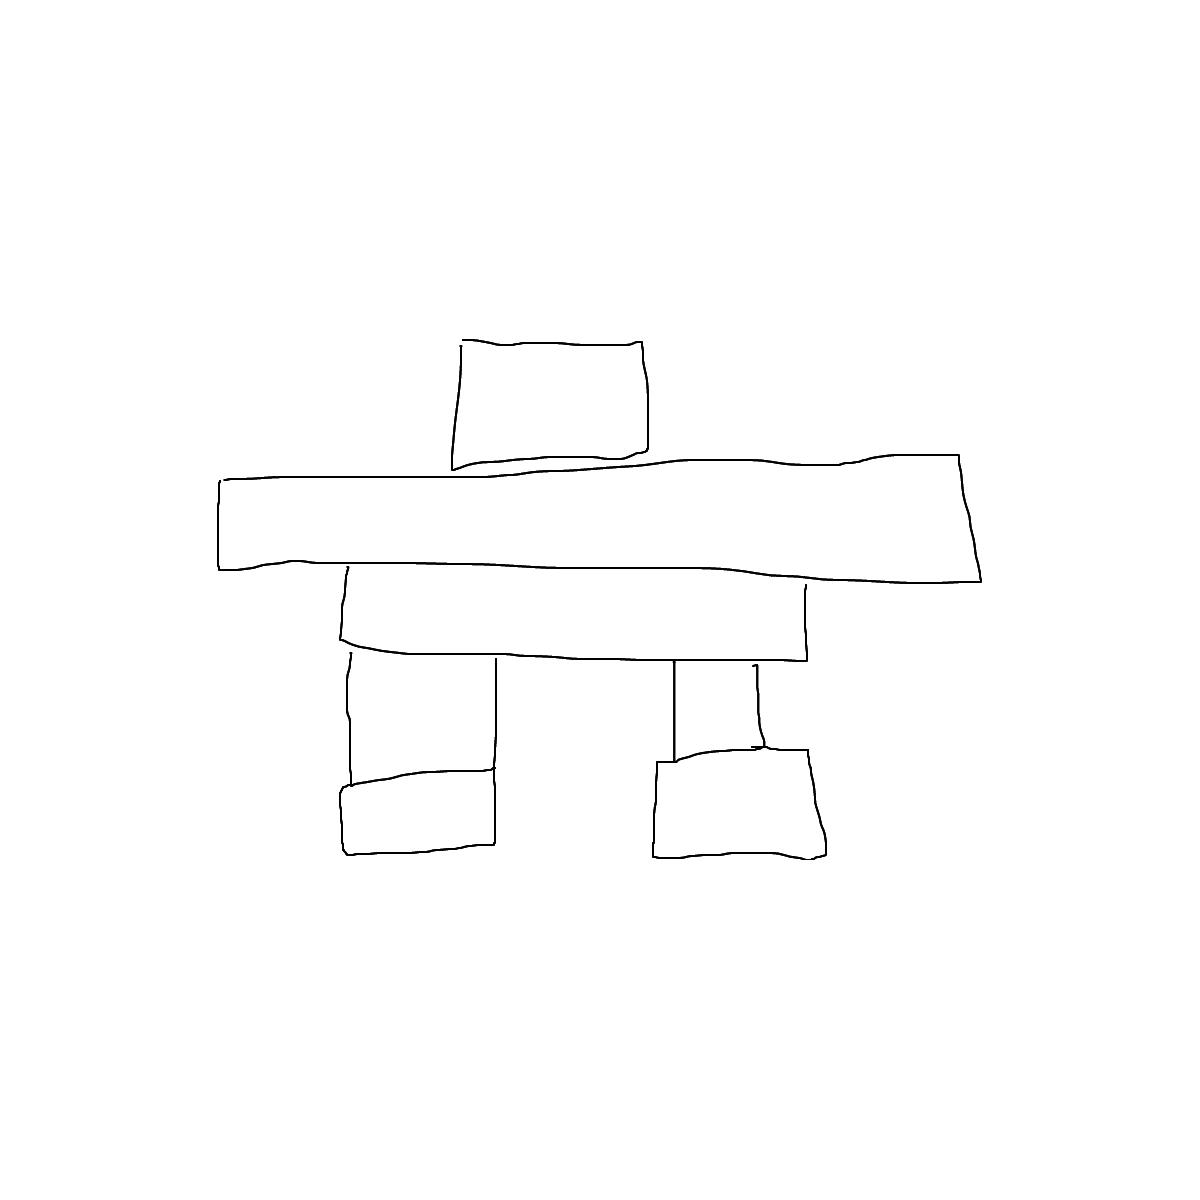 BAAAM drawing#17315 lat:72.7414703369140600lng: -79.3480377197265600